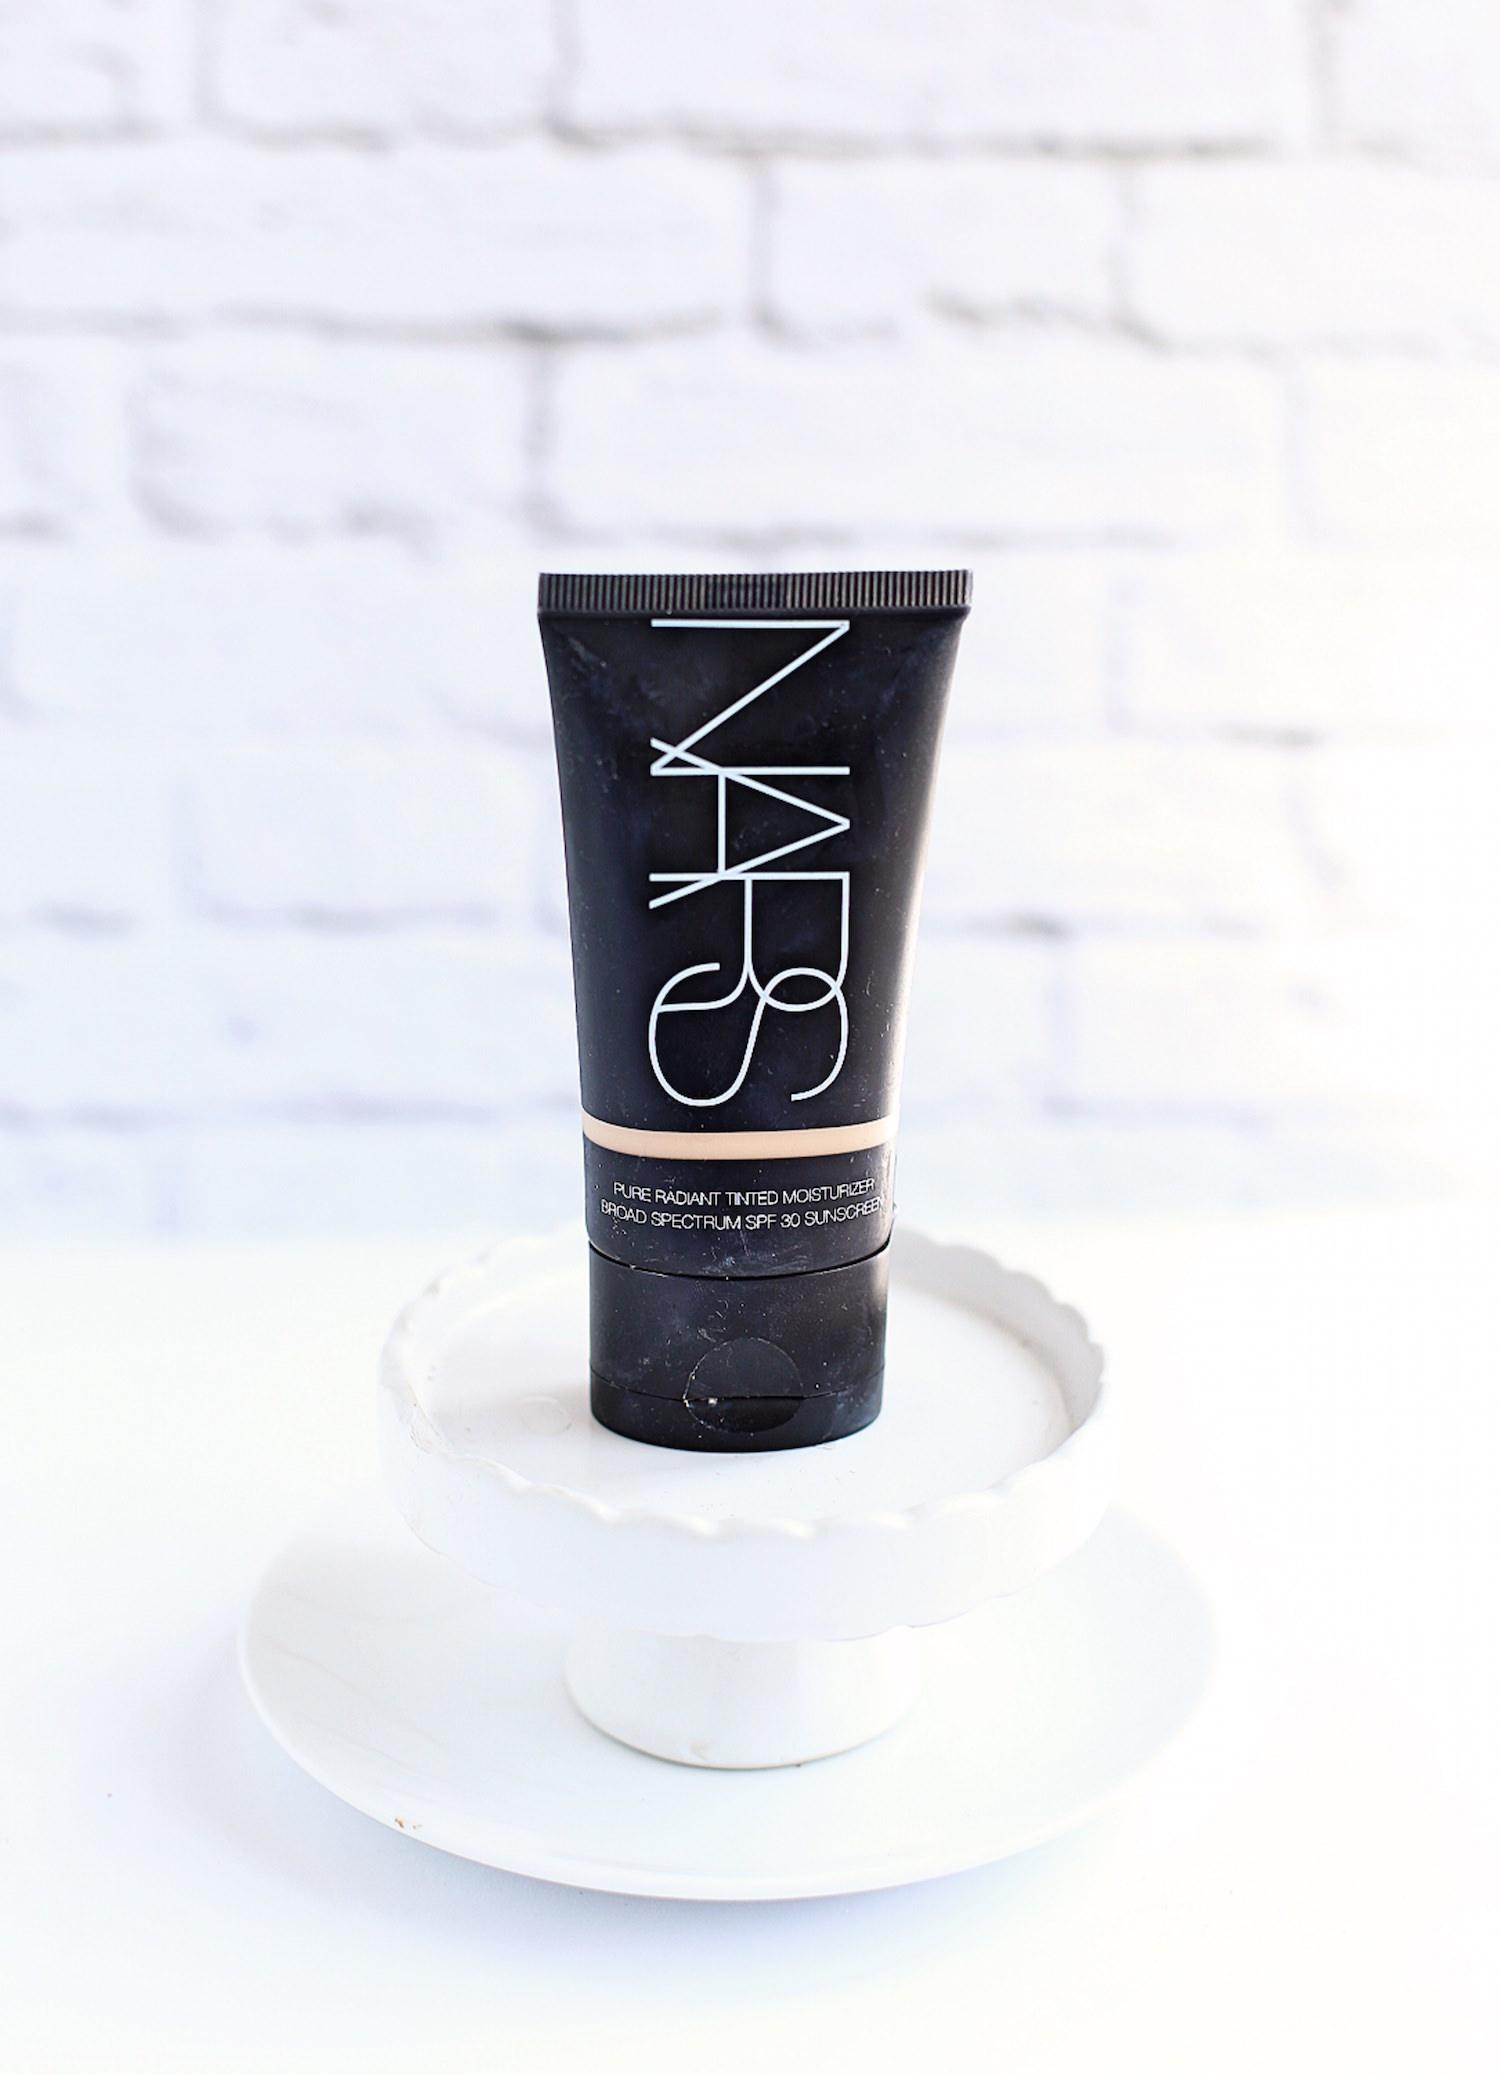 My 10 New Favorite Beauty Products - Nars Tinted Moisturizer | TrufflesandTrends.com